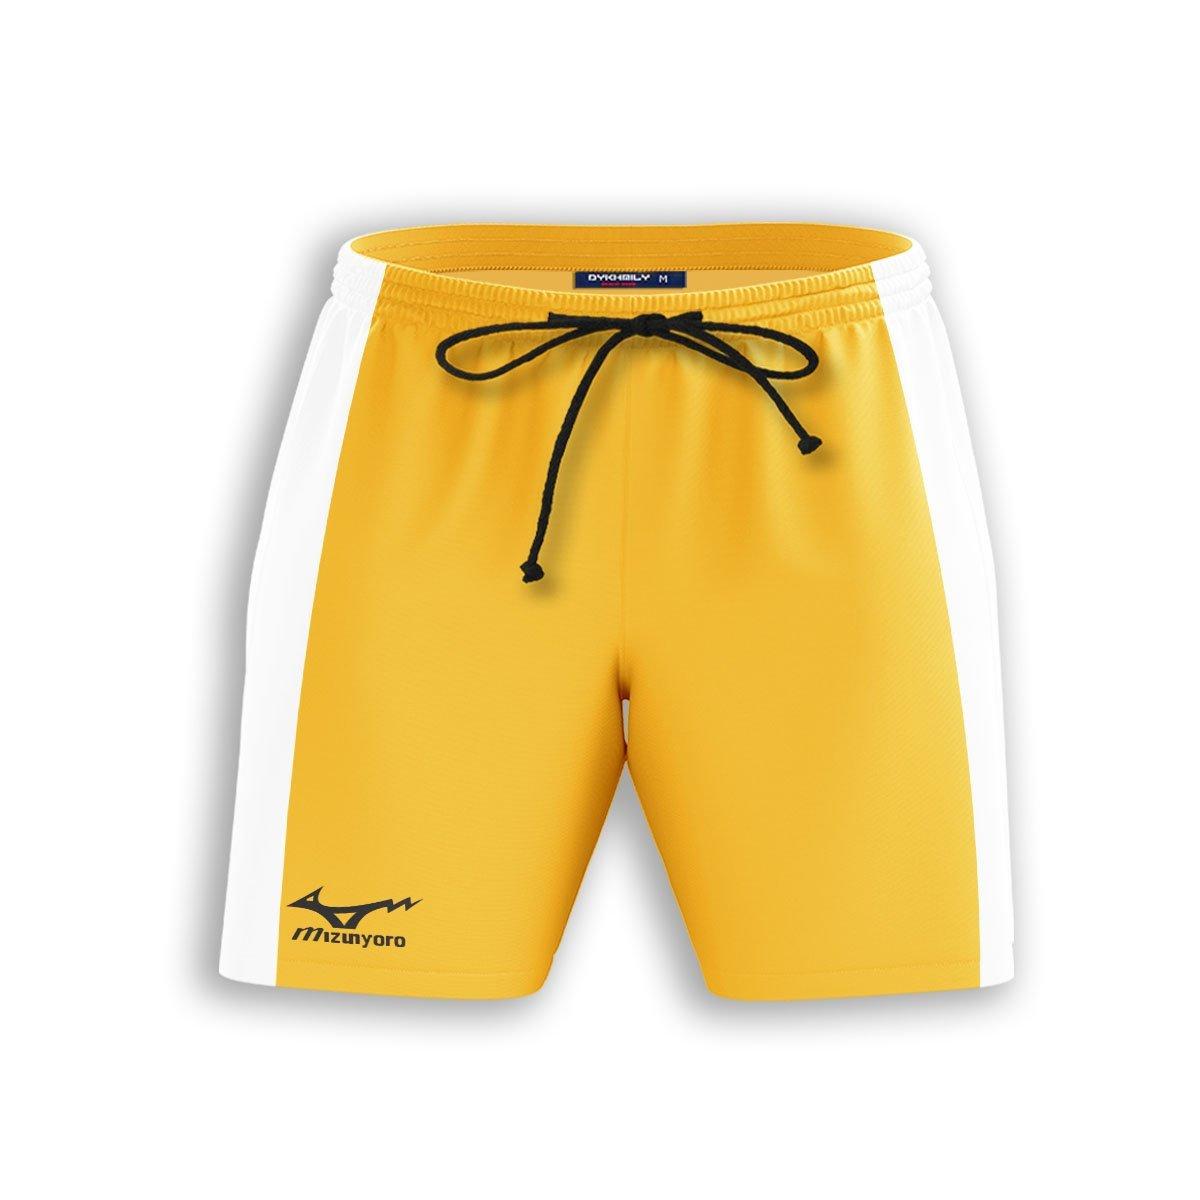 Team Johzenji Beach Shorts FDM3107 S Official Anime Swimsuit Merch